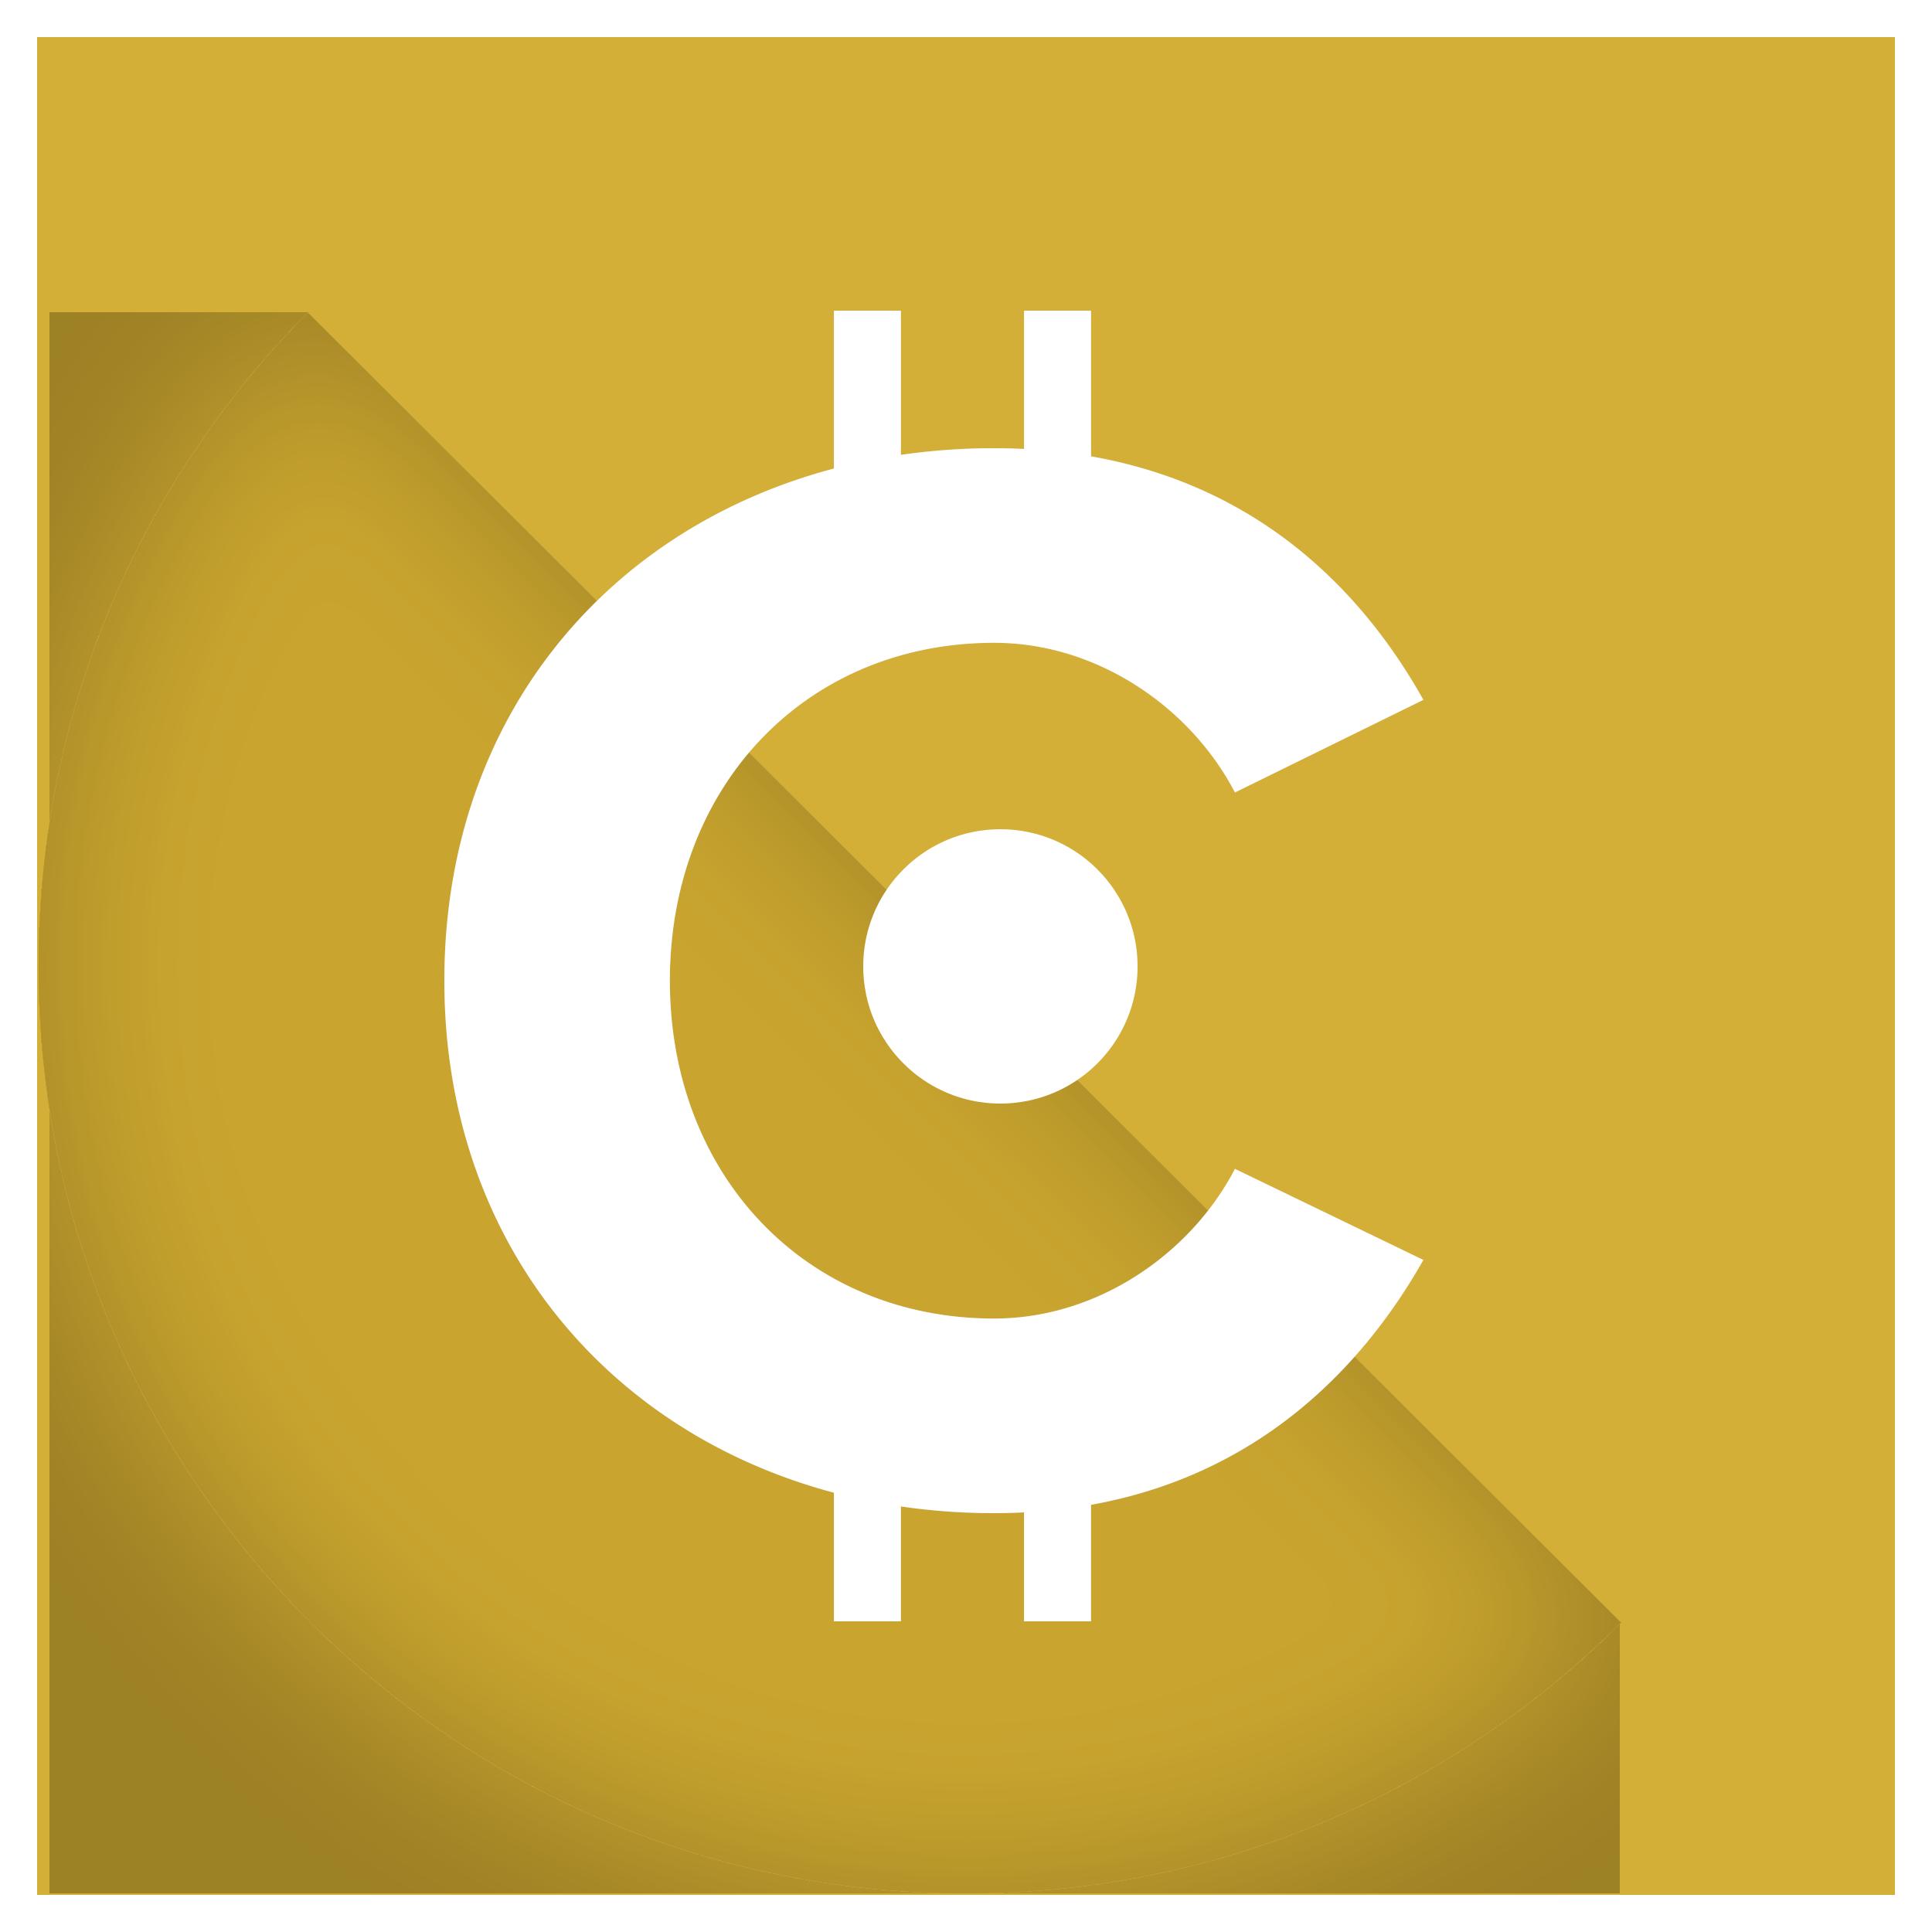 Shop Local and Earn Bitcoin